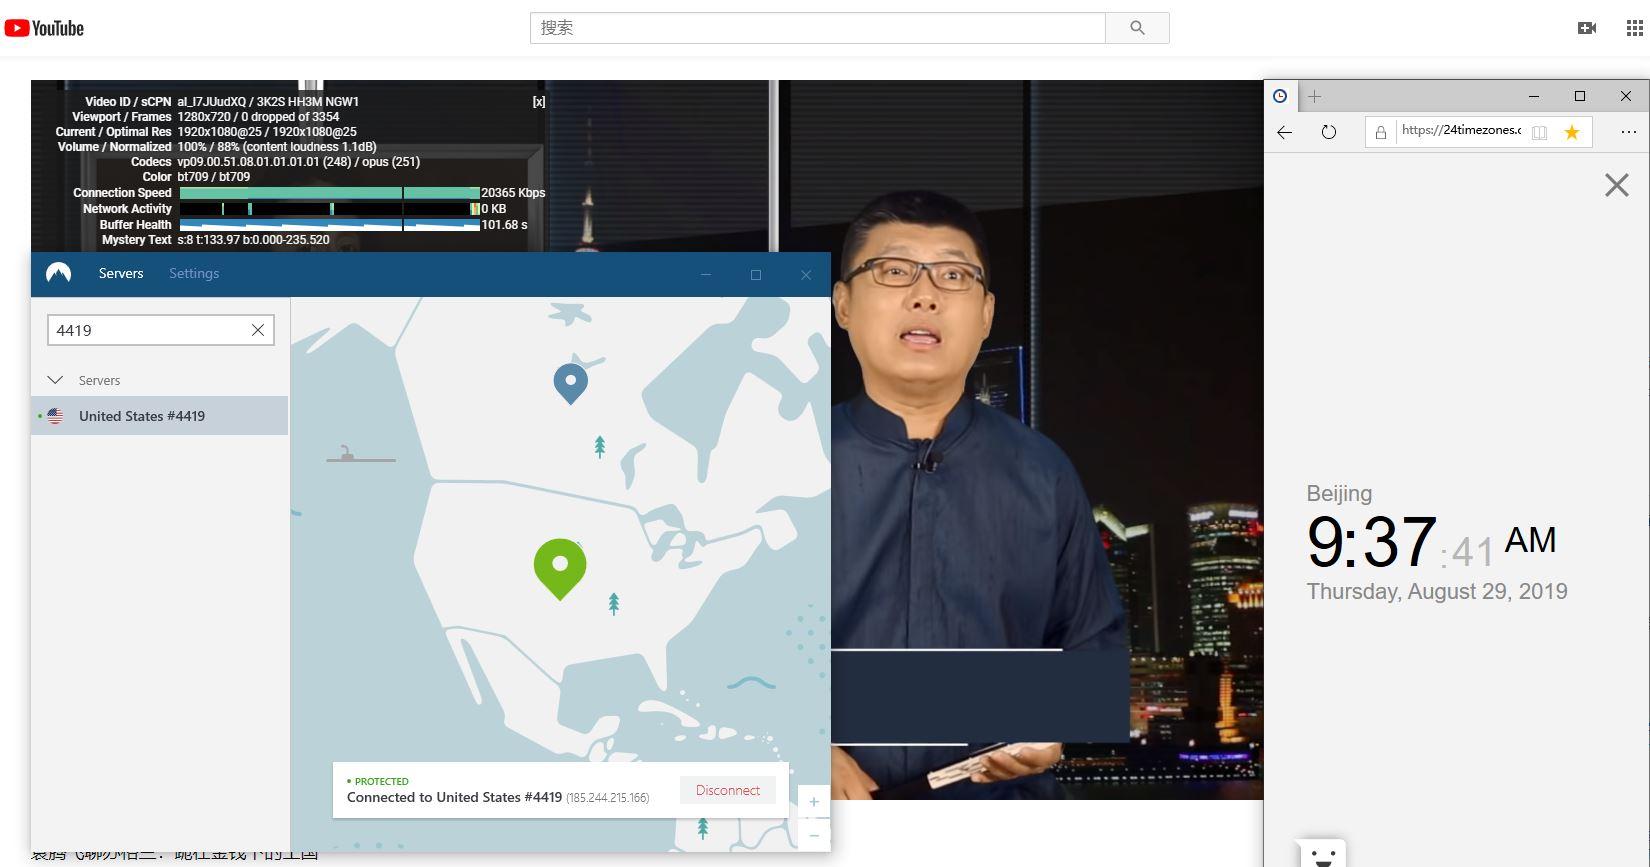 nordvpn windows 美国4419服务器 中国翻墙 科学上网 YouTube测速1-20190829